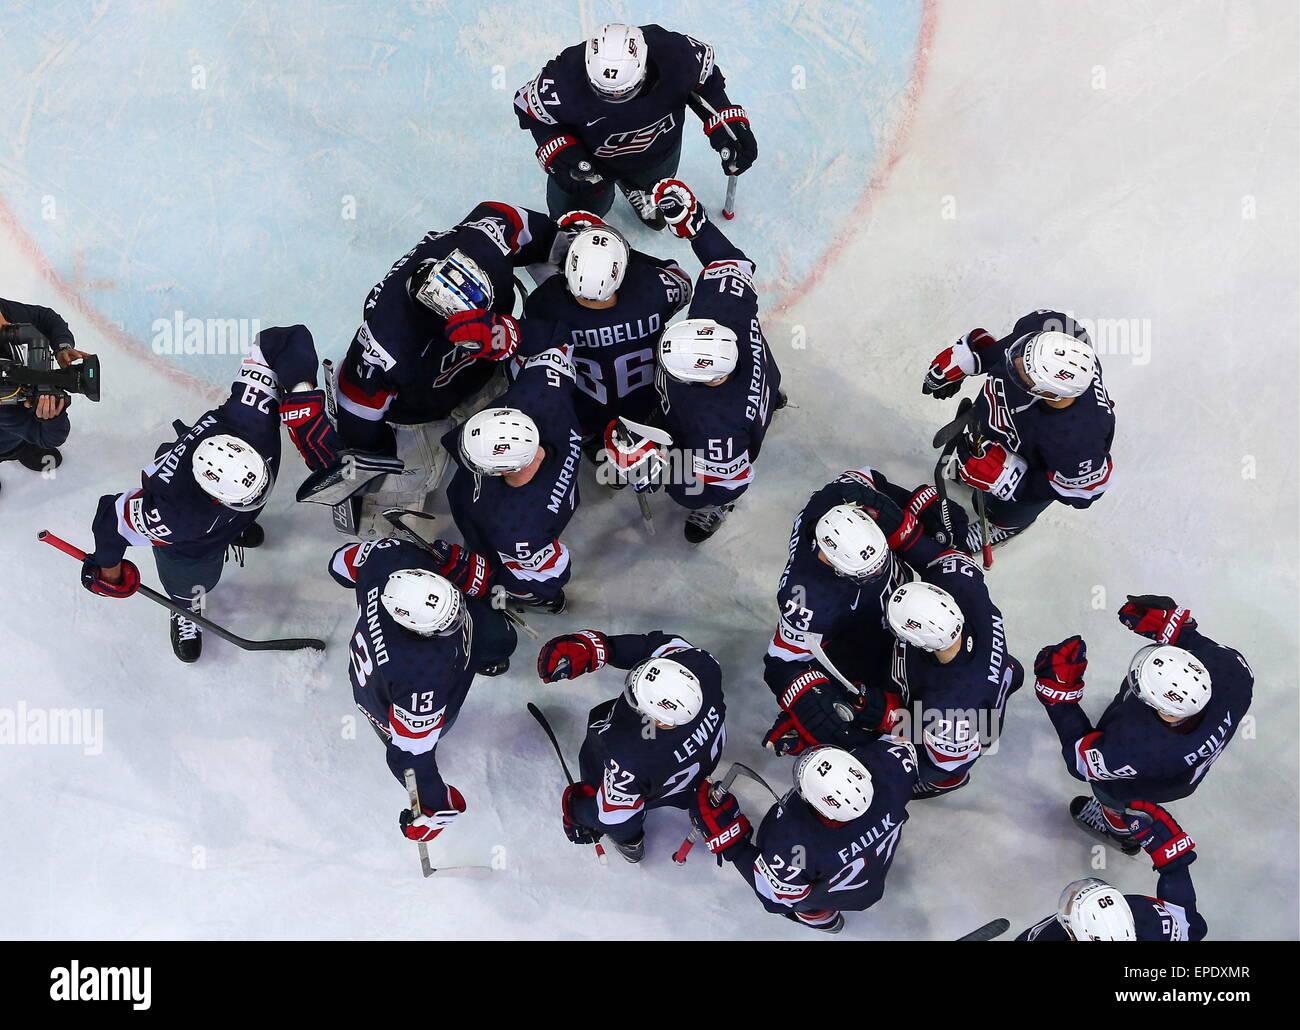 Sammeln & Seltenes Fahne Banner 2015 Ice Hockey World Championship Czech Republic Prag Ostarva # 27